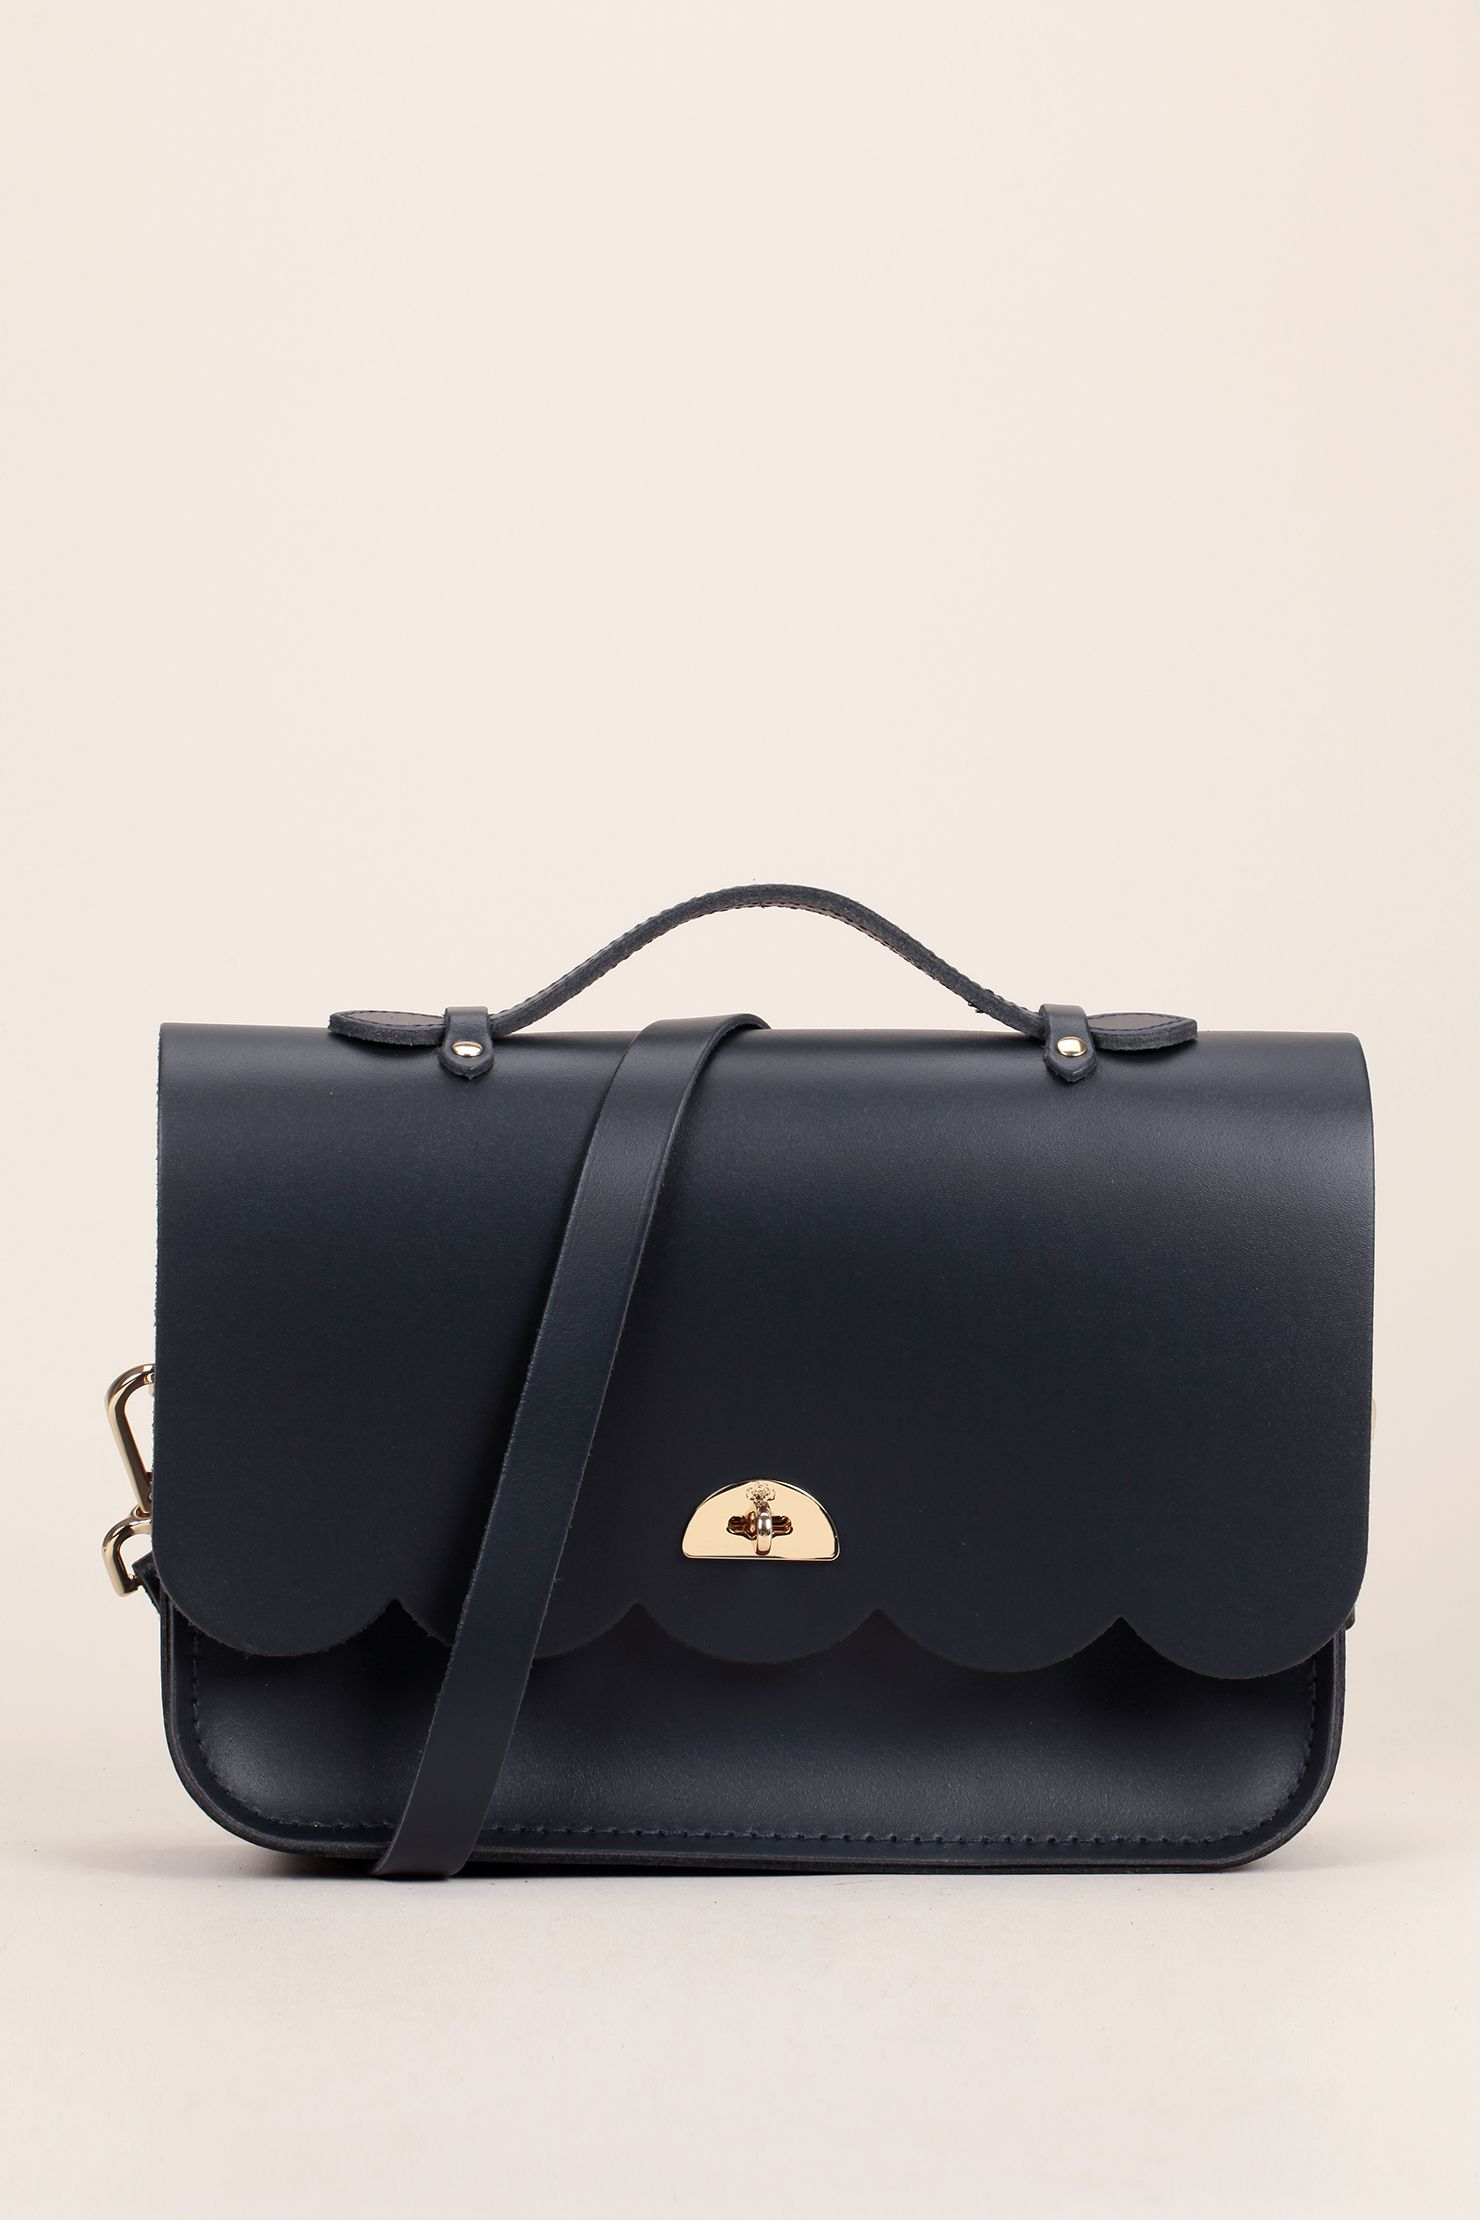 dae32bd784ba Cloud bag with handle navy - The Cambridge Satchel Company ...